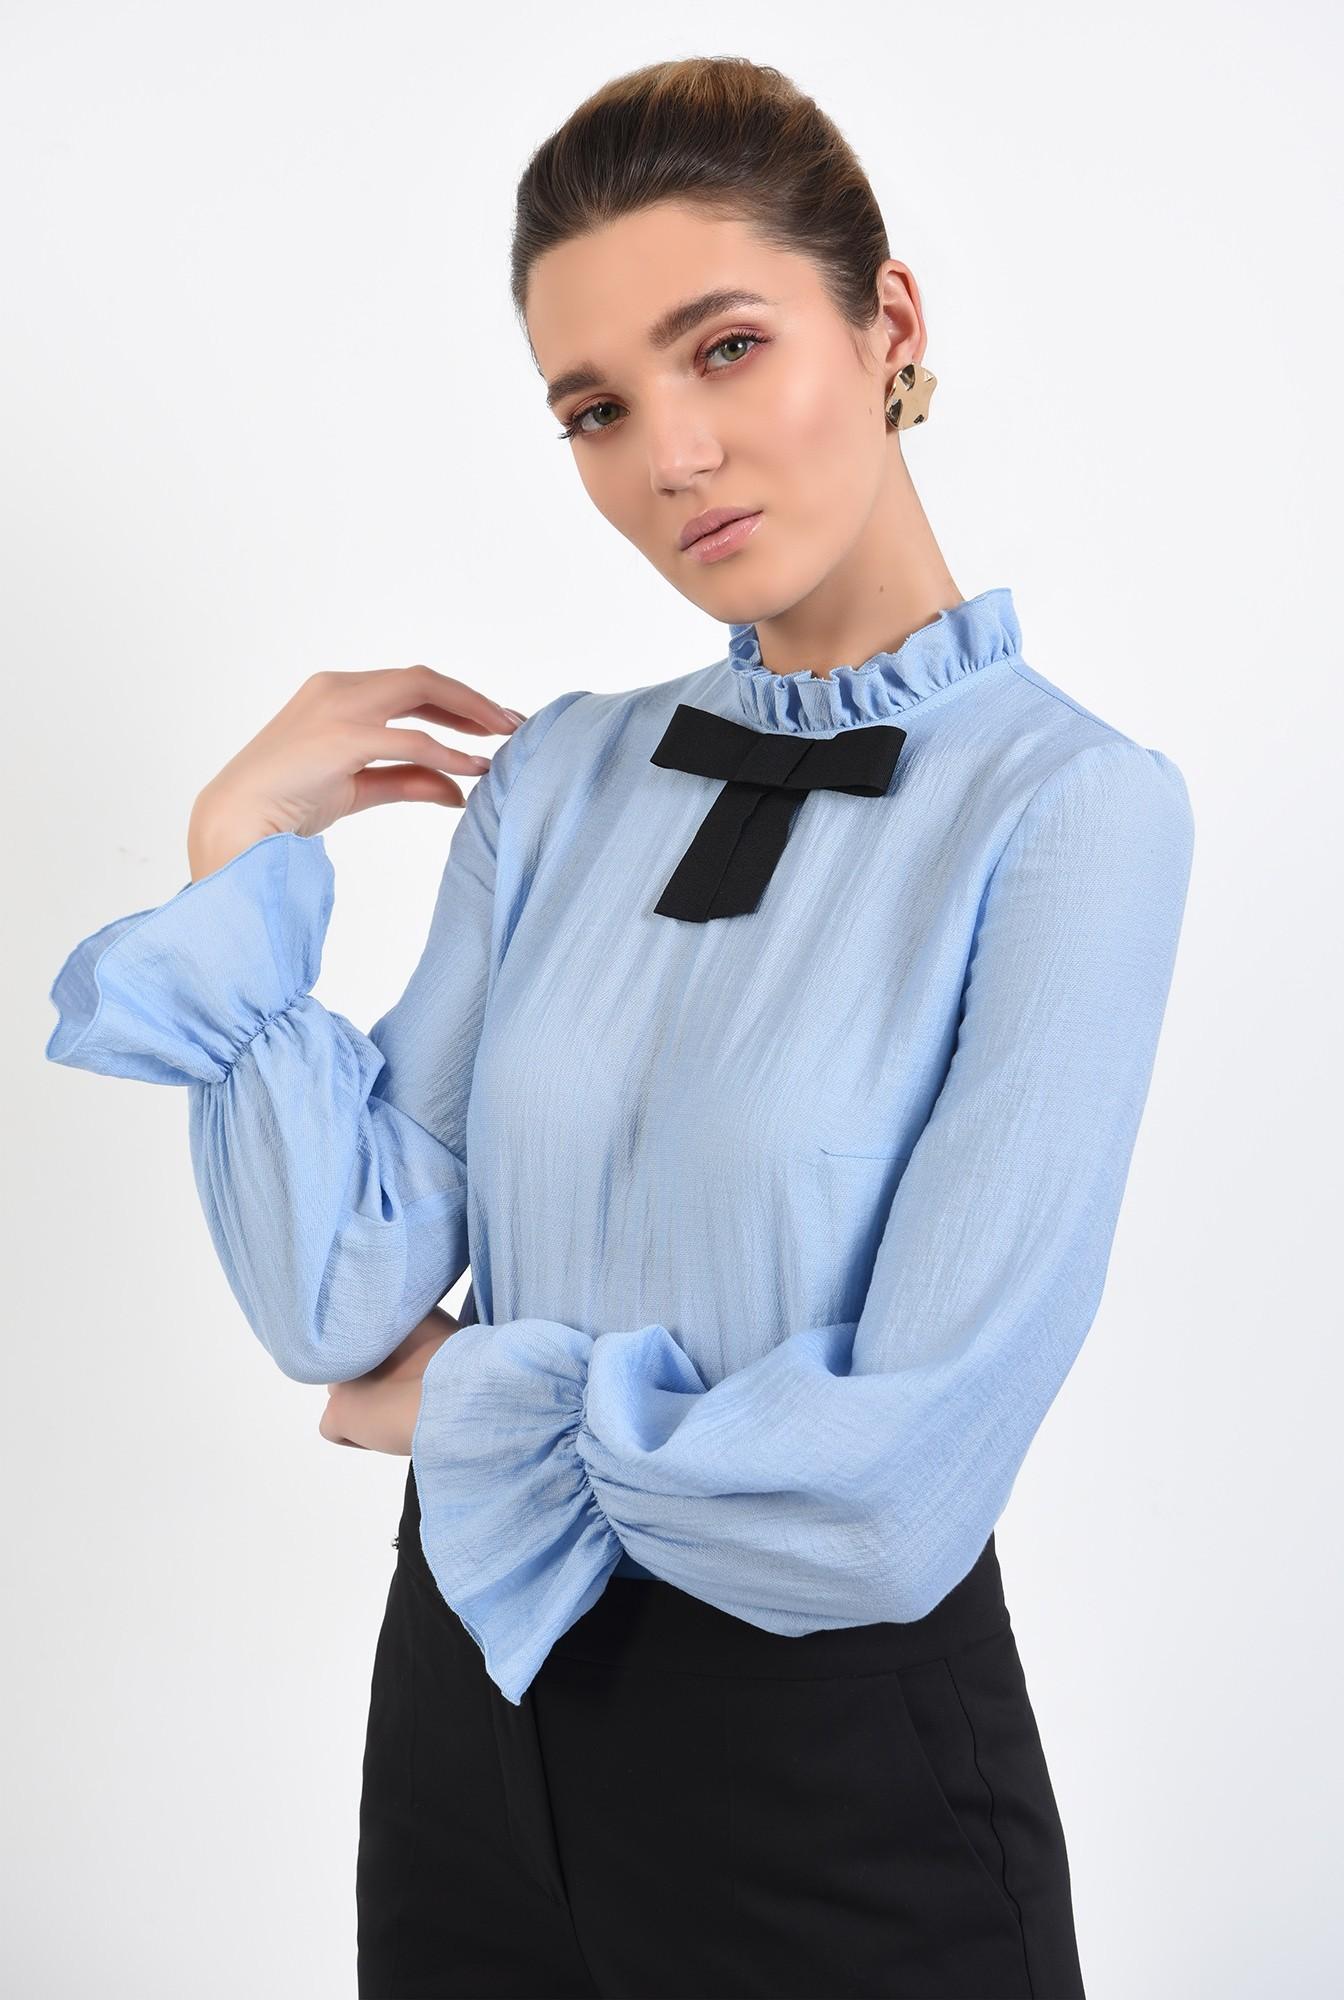 2 - bluza office, bleu, cu funda, mansete volan, guler incretit